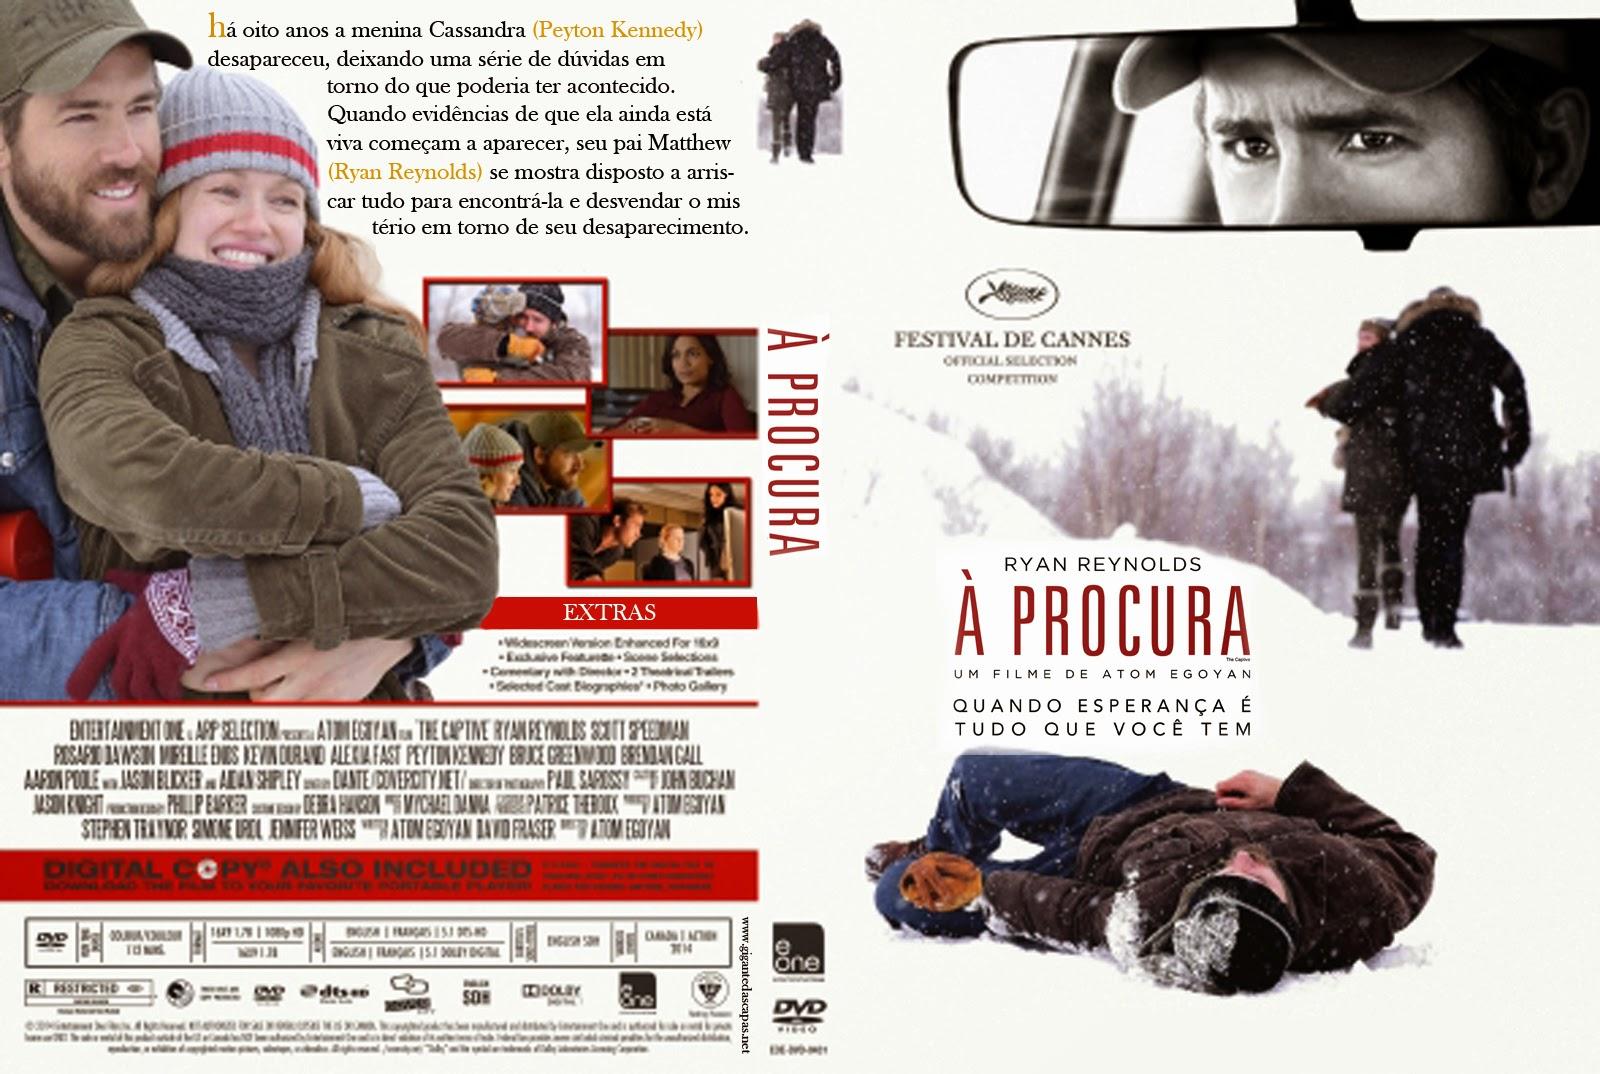 Download À Procura DVD-R  C3 80 2BPROCURA